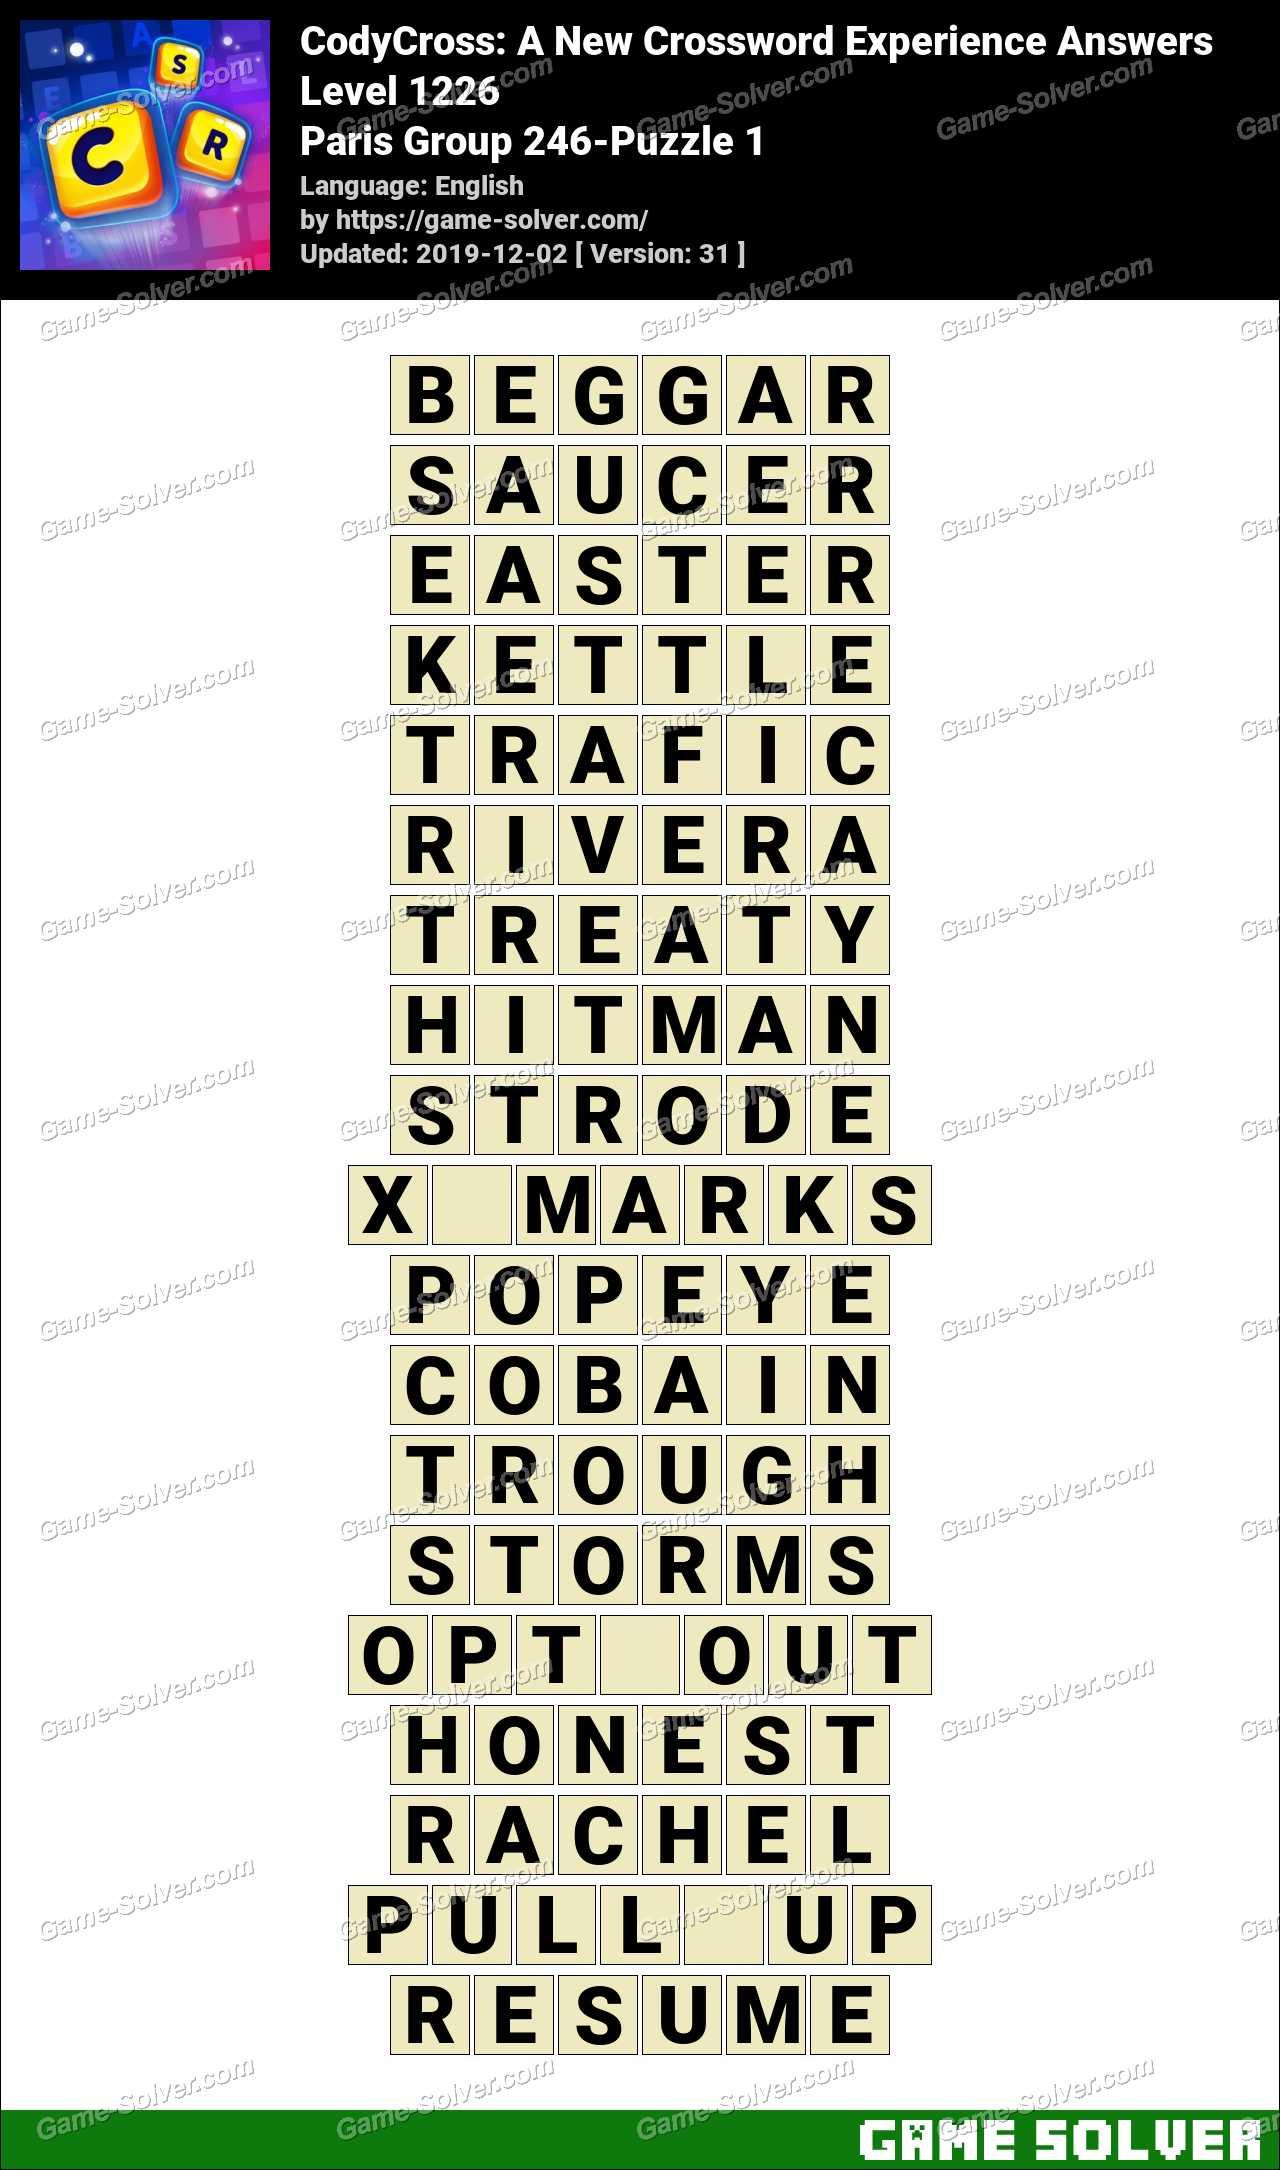 CodyCross Paris Group 246-Puzzle 1 Answers